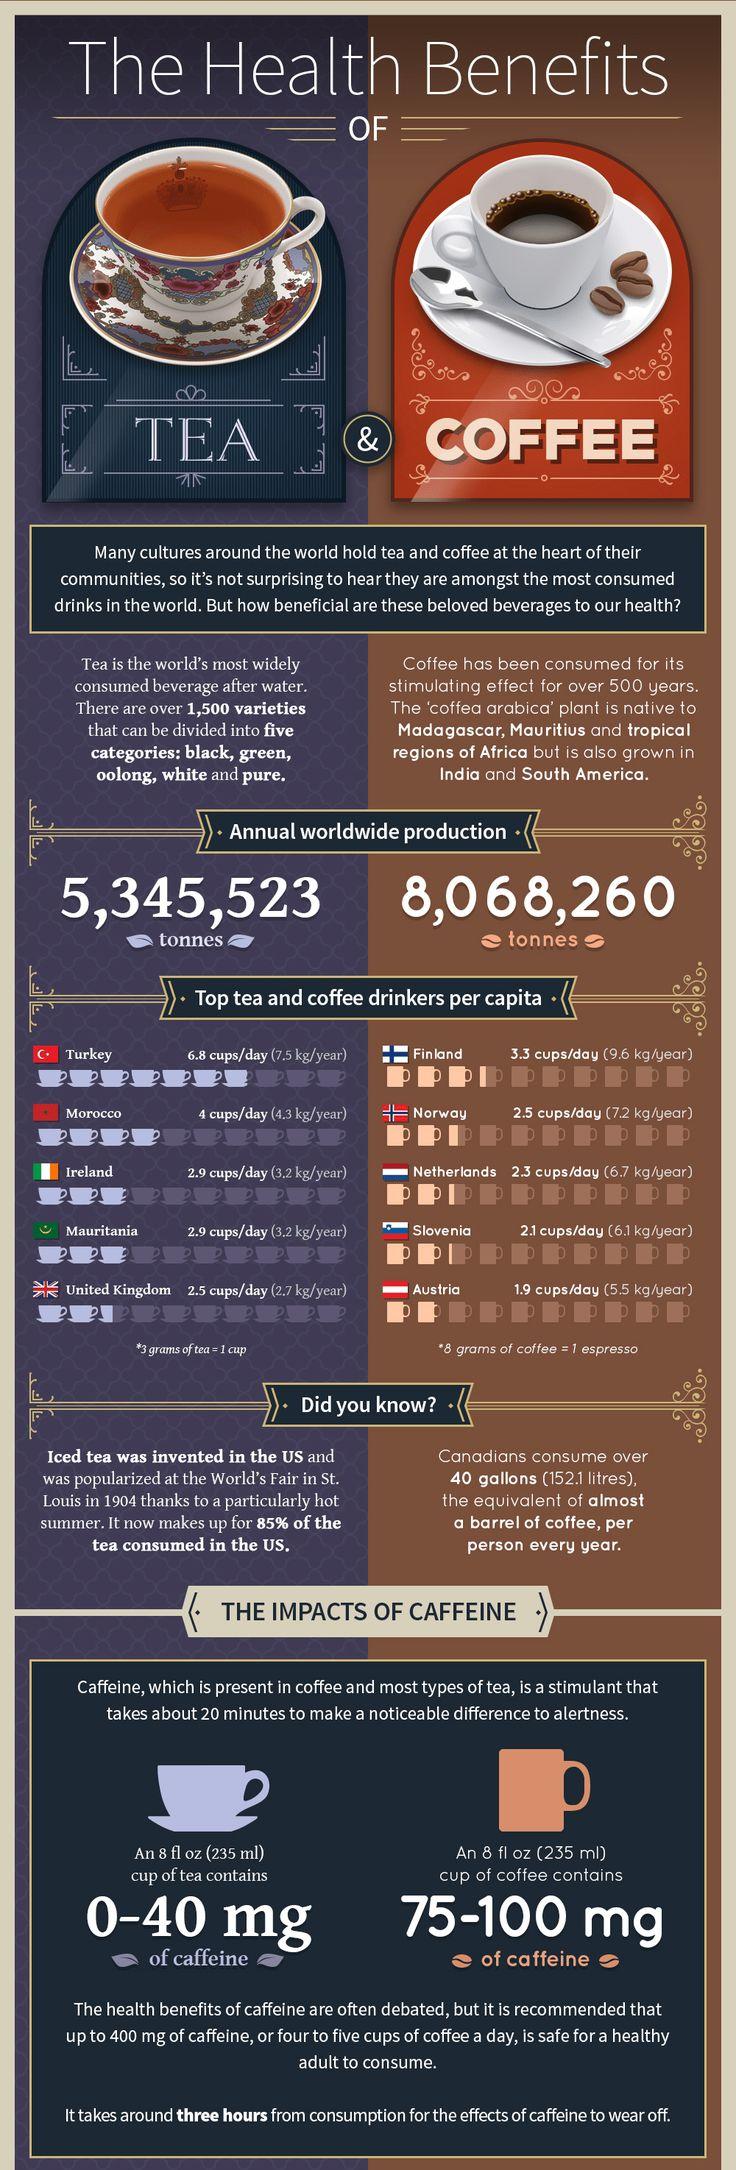 The Health Benefits Of Tea #Infographic #Health #Tea